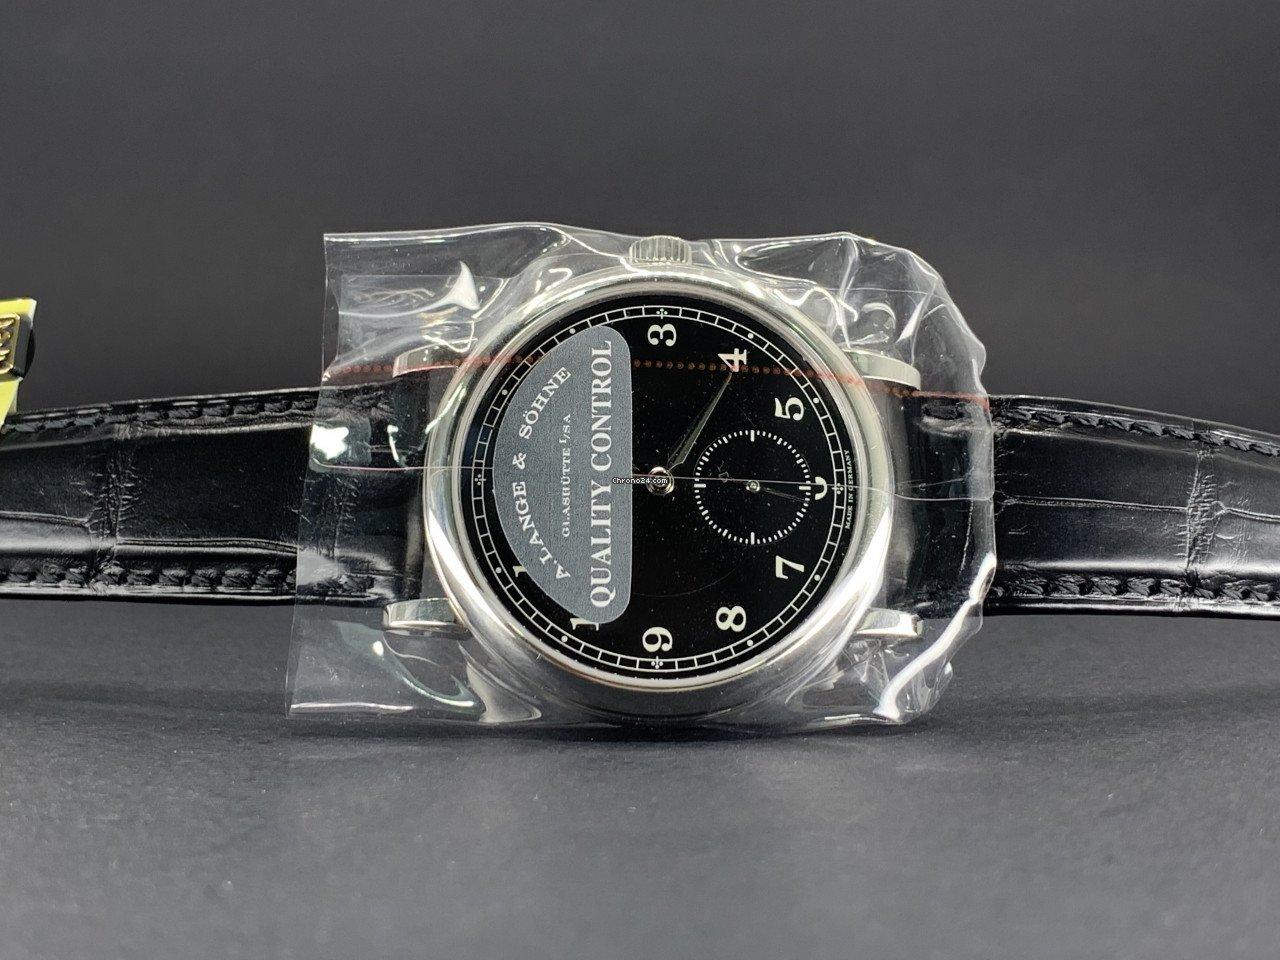 A. Lange & Söhne 1815 236.049 new